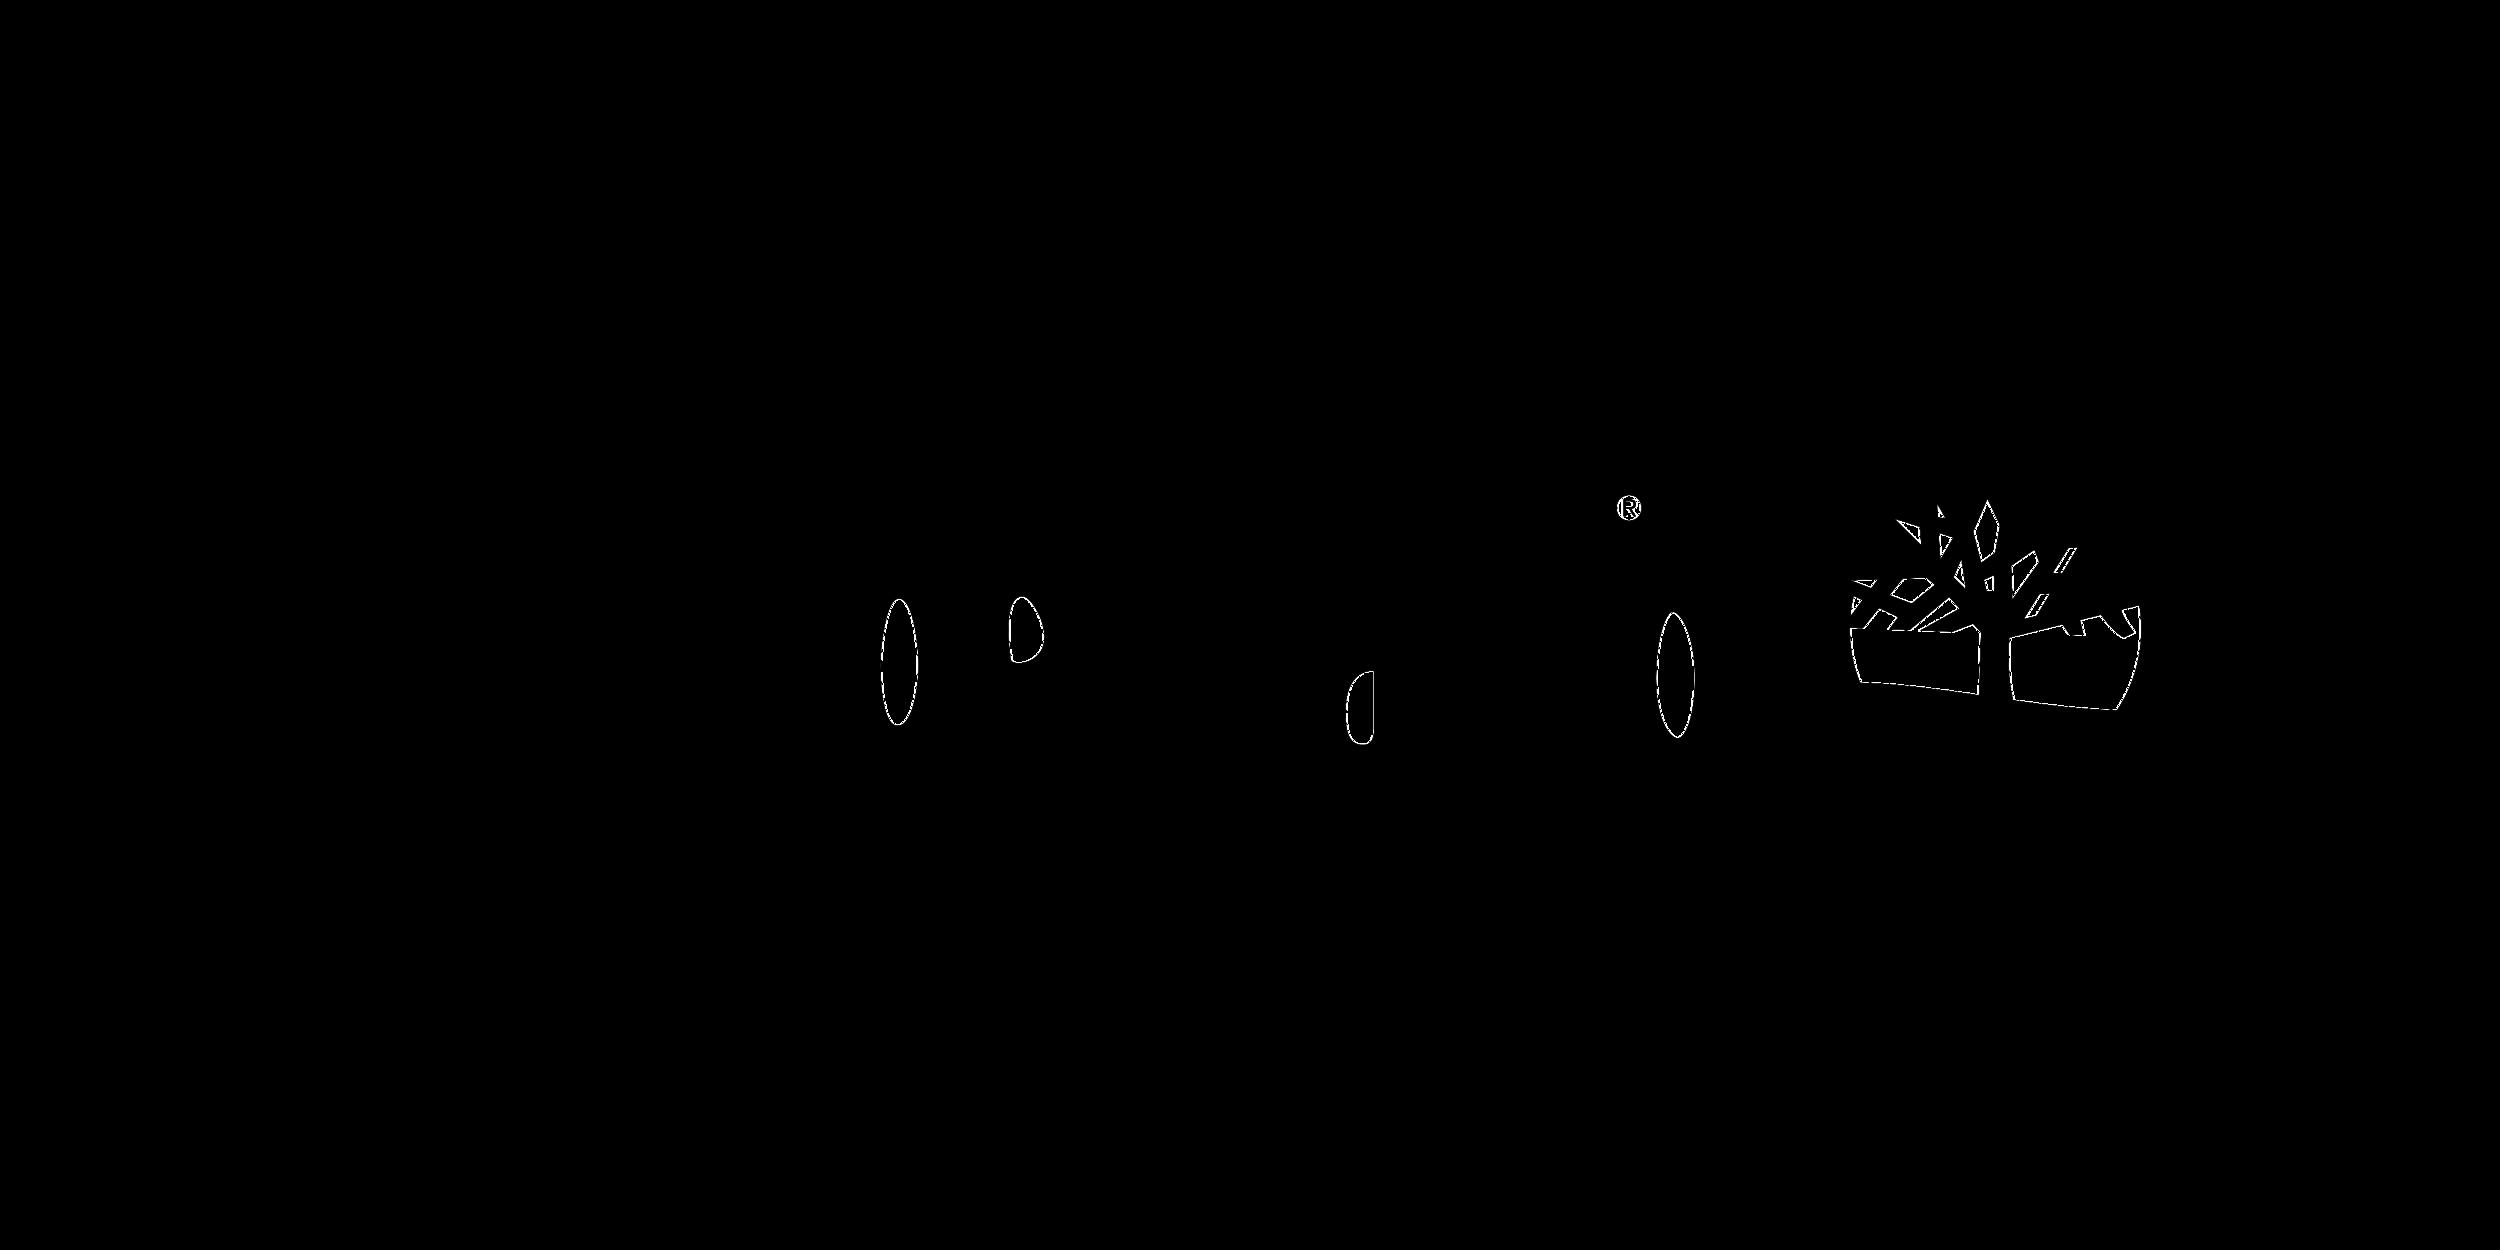 wah-wah-timberland-logo.png